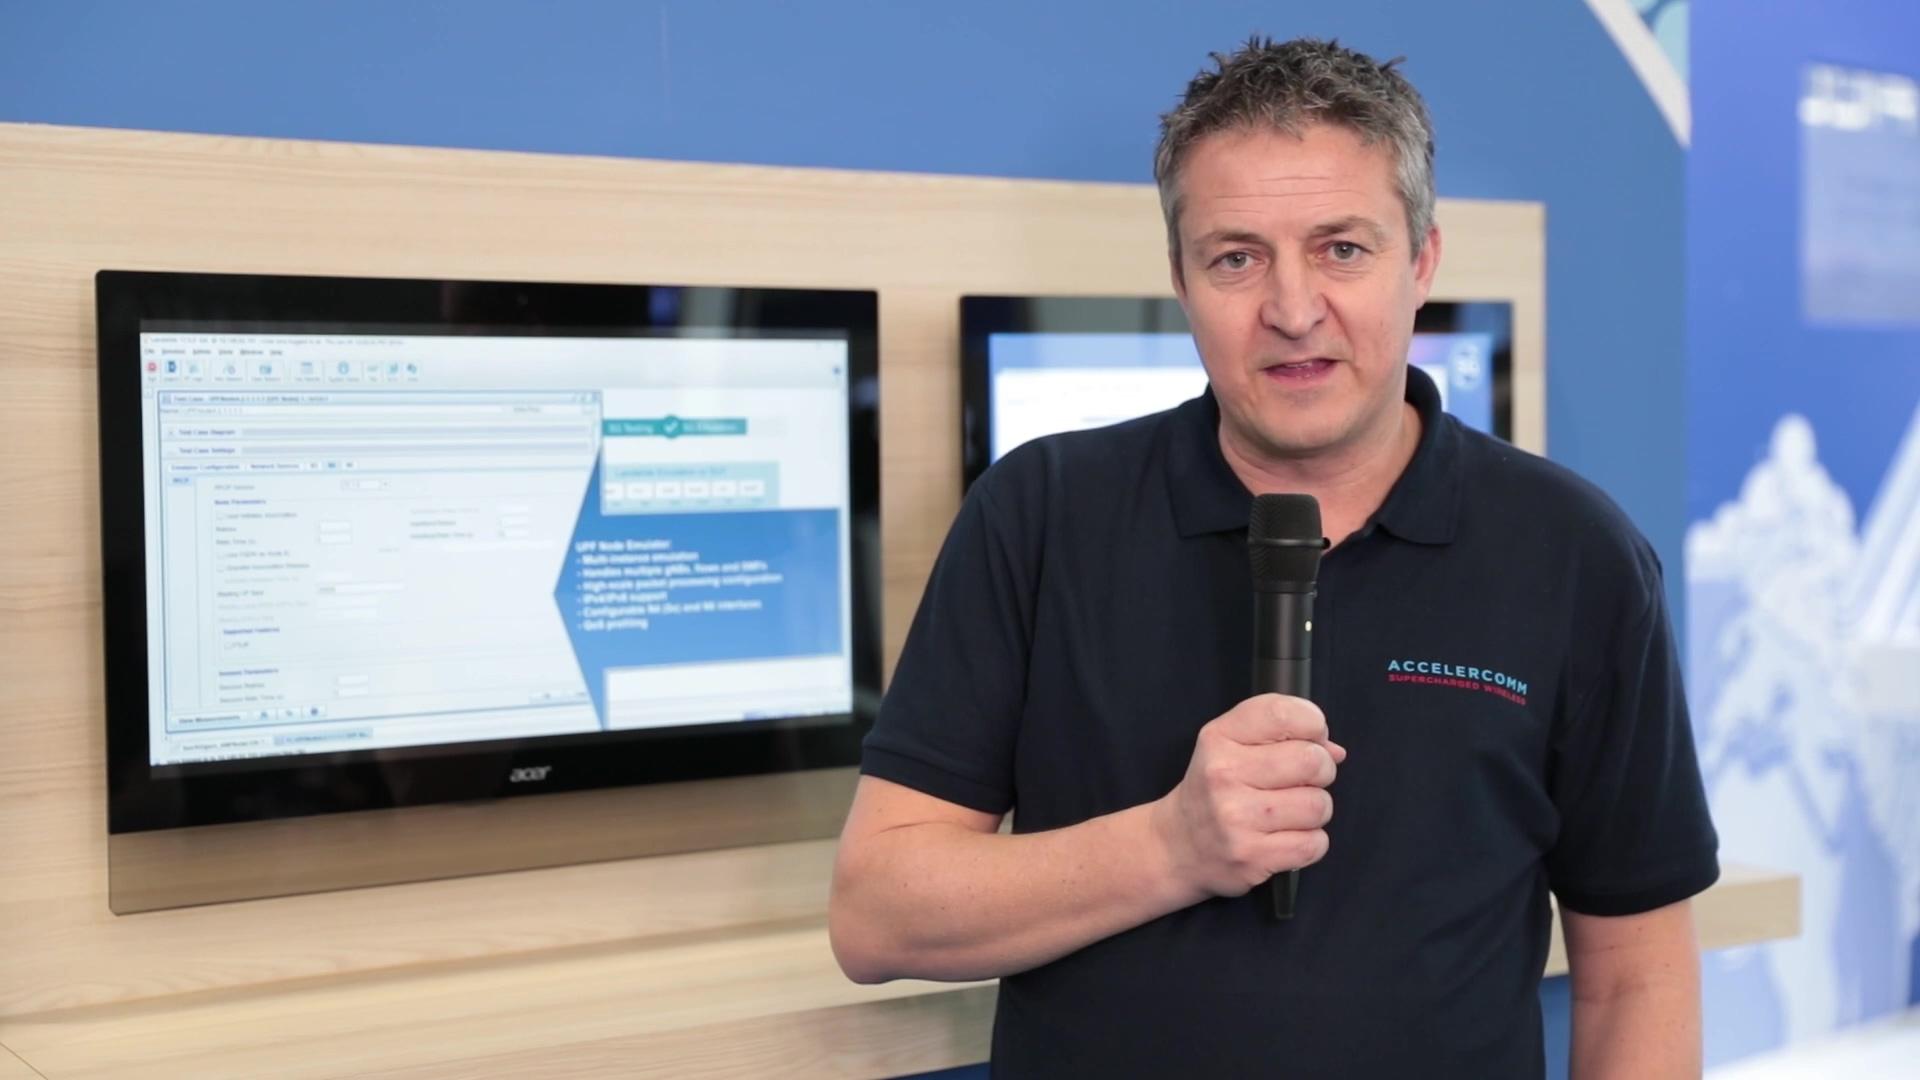 In market 5G NR test equipment using Accelercomm Polar IP